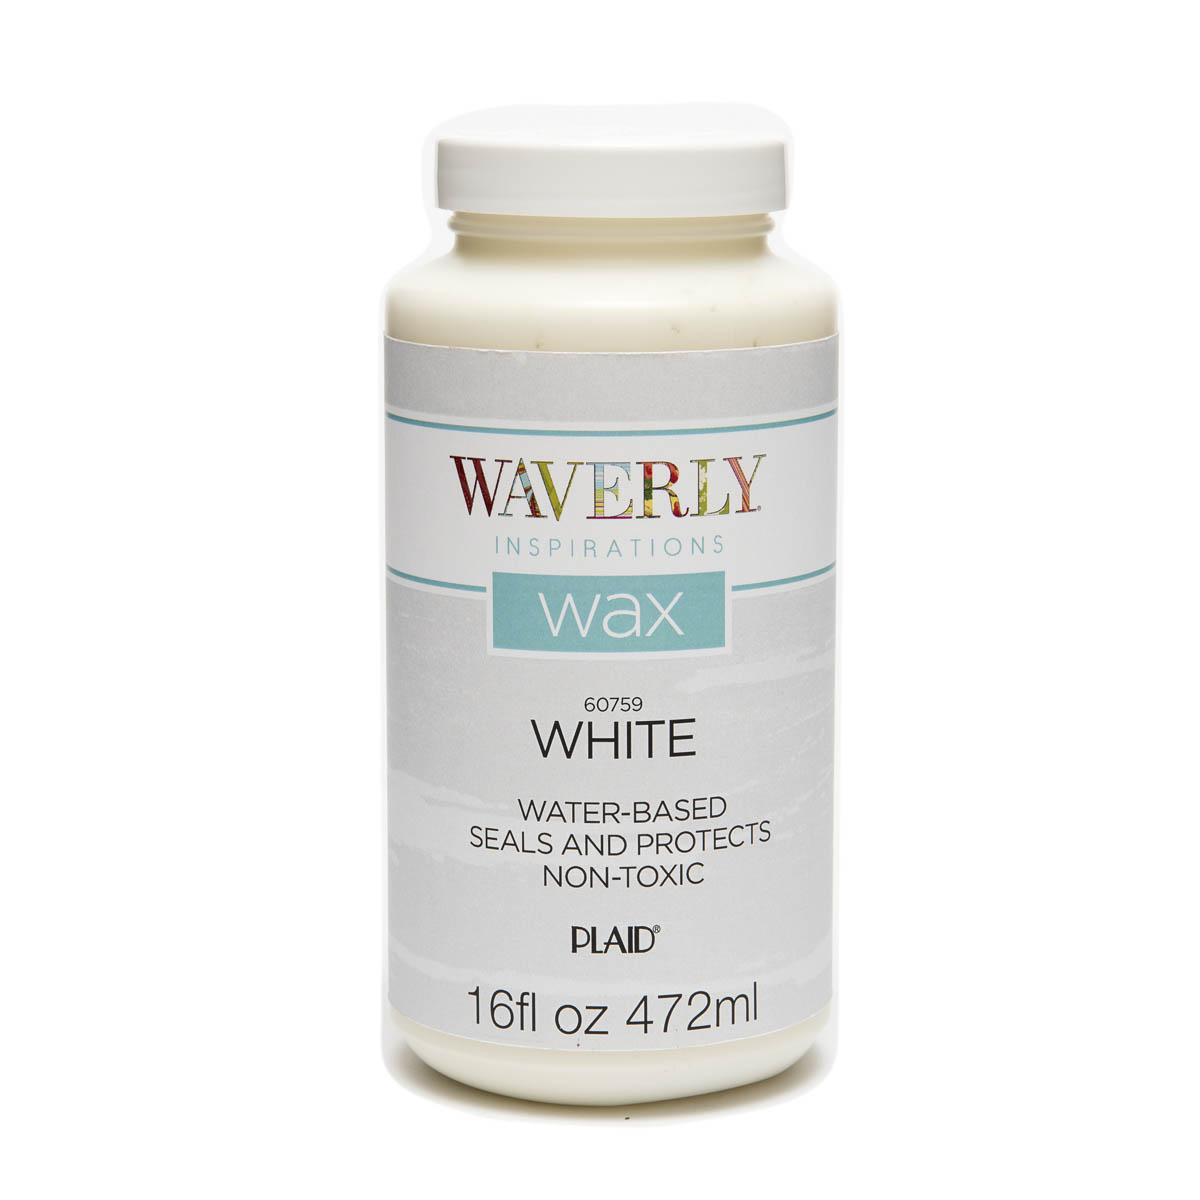 Waverly ® Inspirations Wax - White, 16 oz. - 60759E